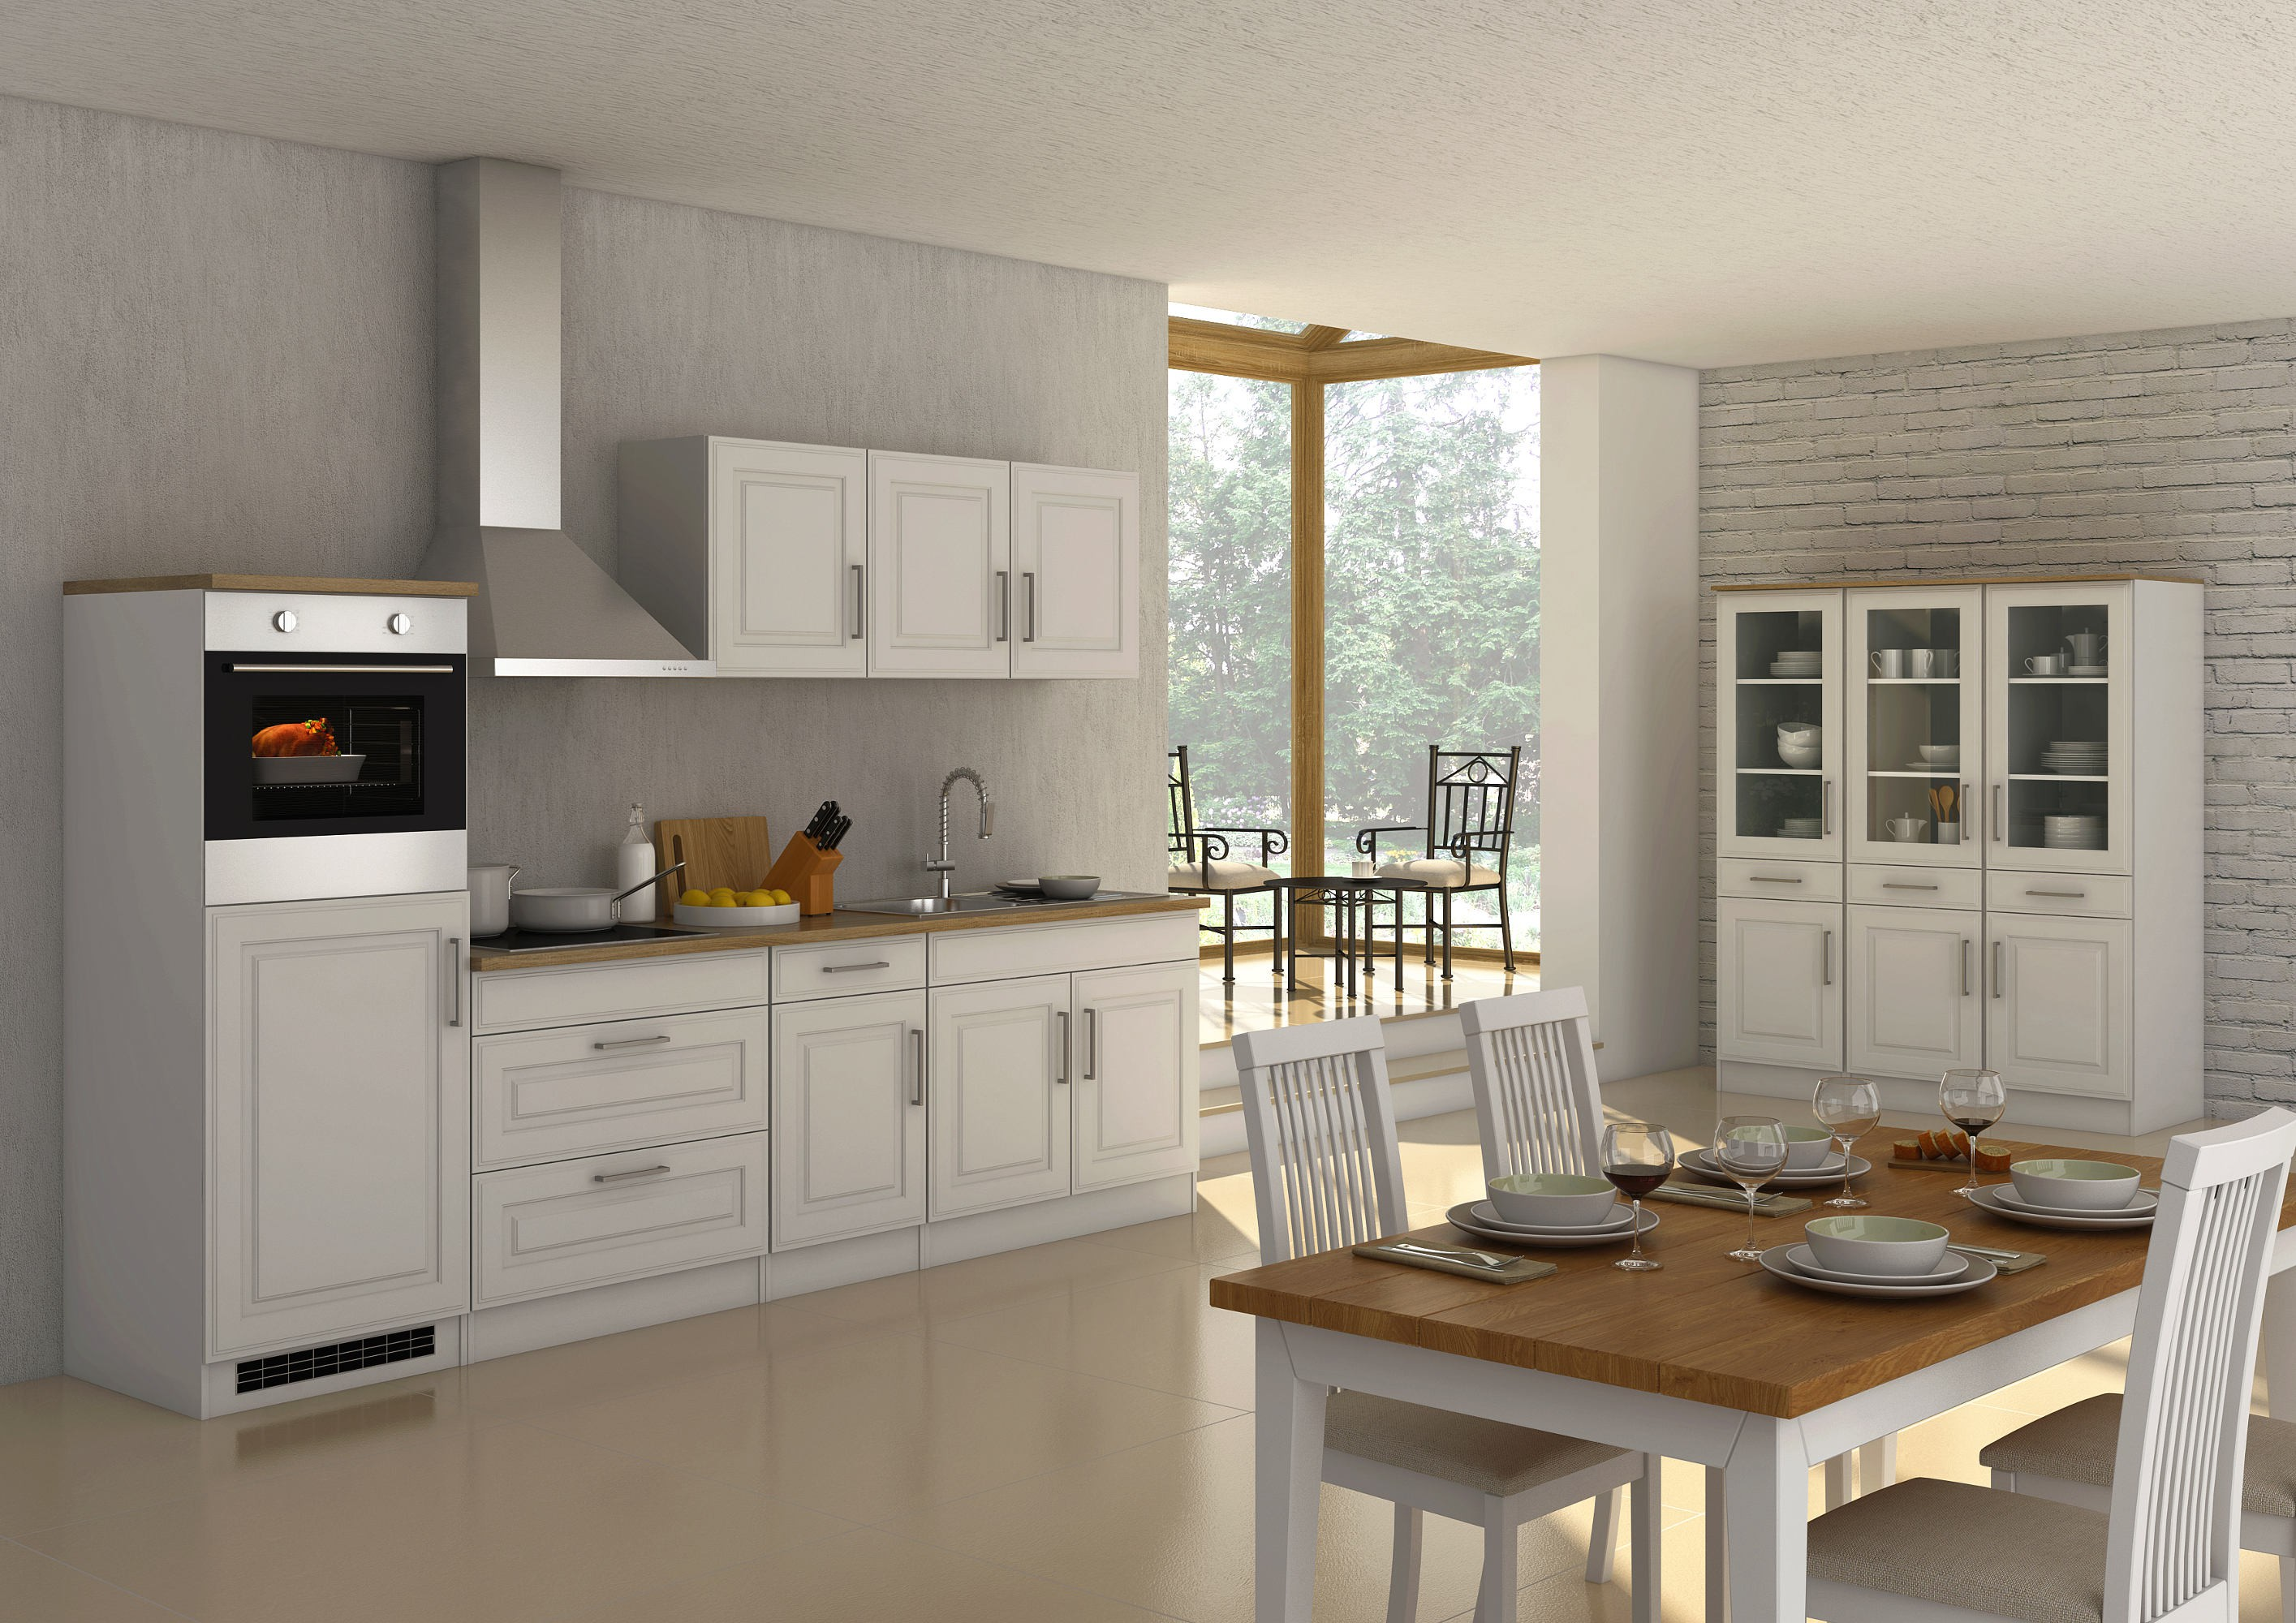 Küchen Apothekerschrank KÖLN 1 Front Auszug Weiß Küche